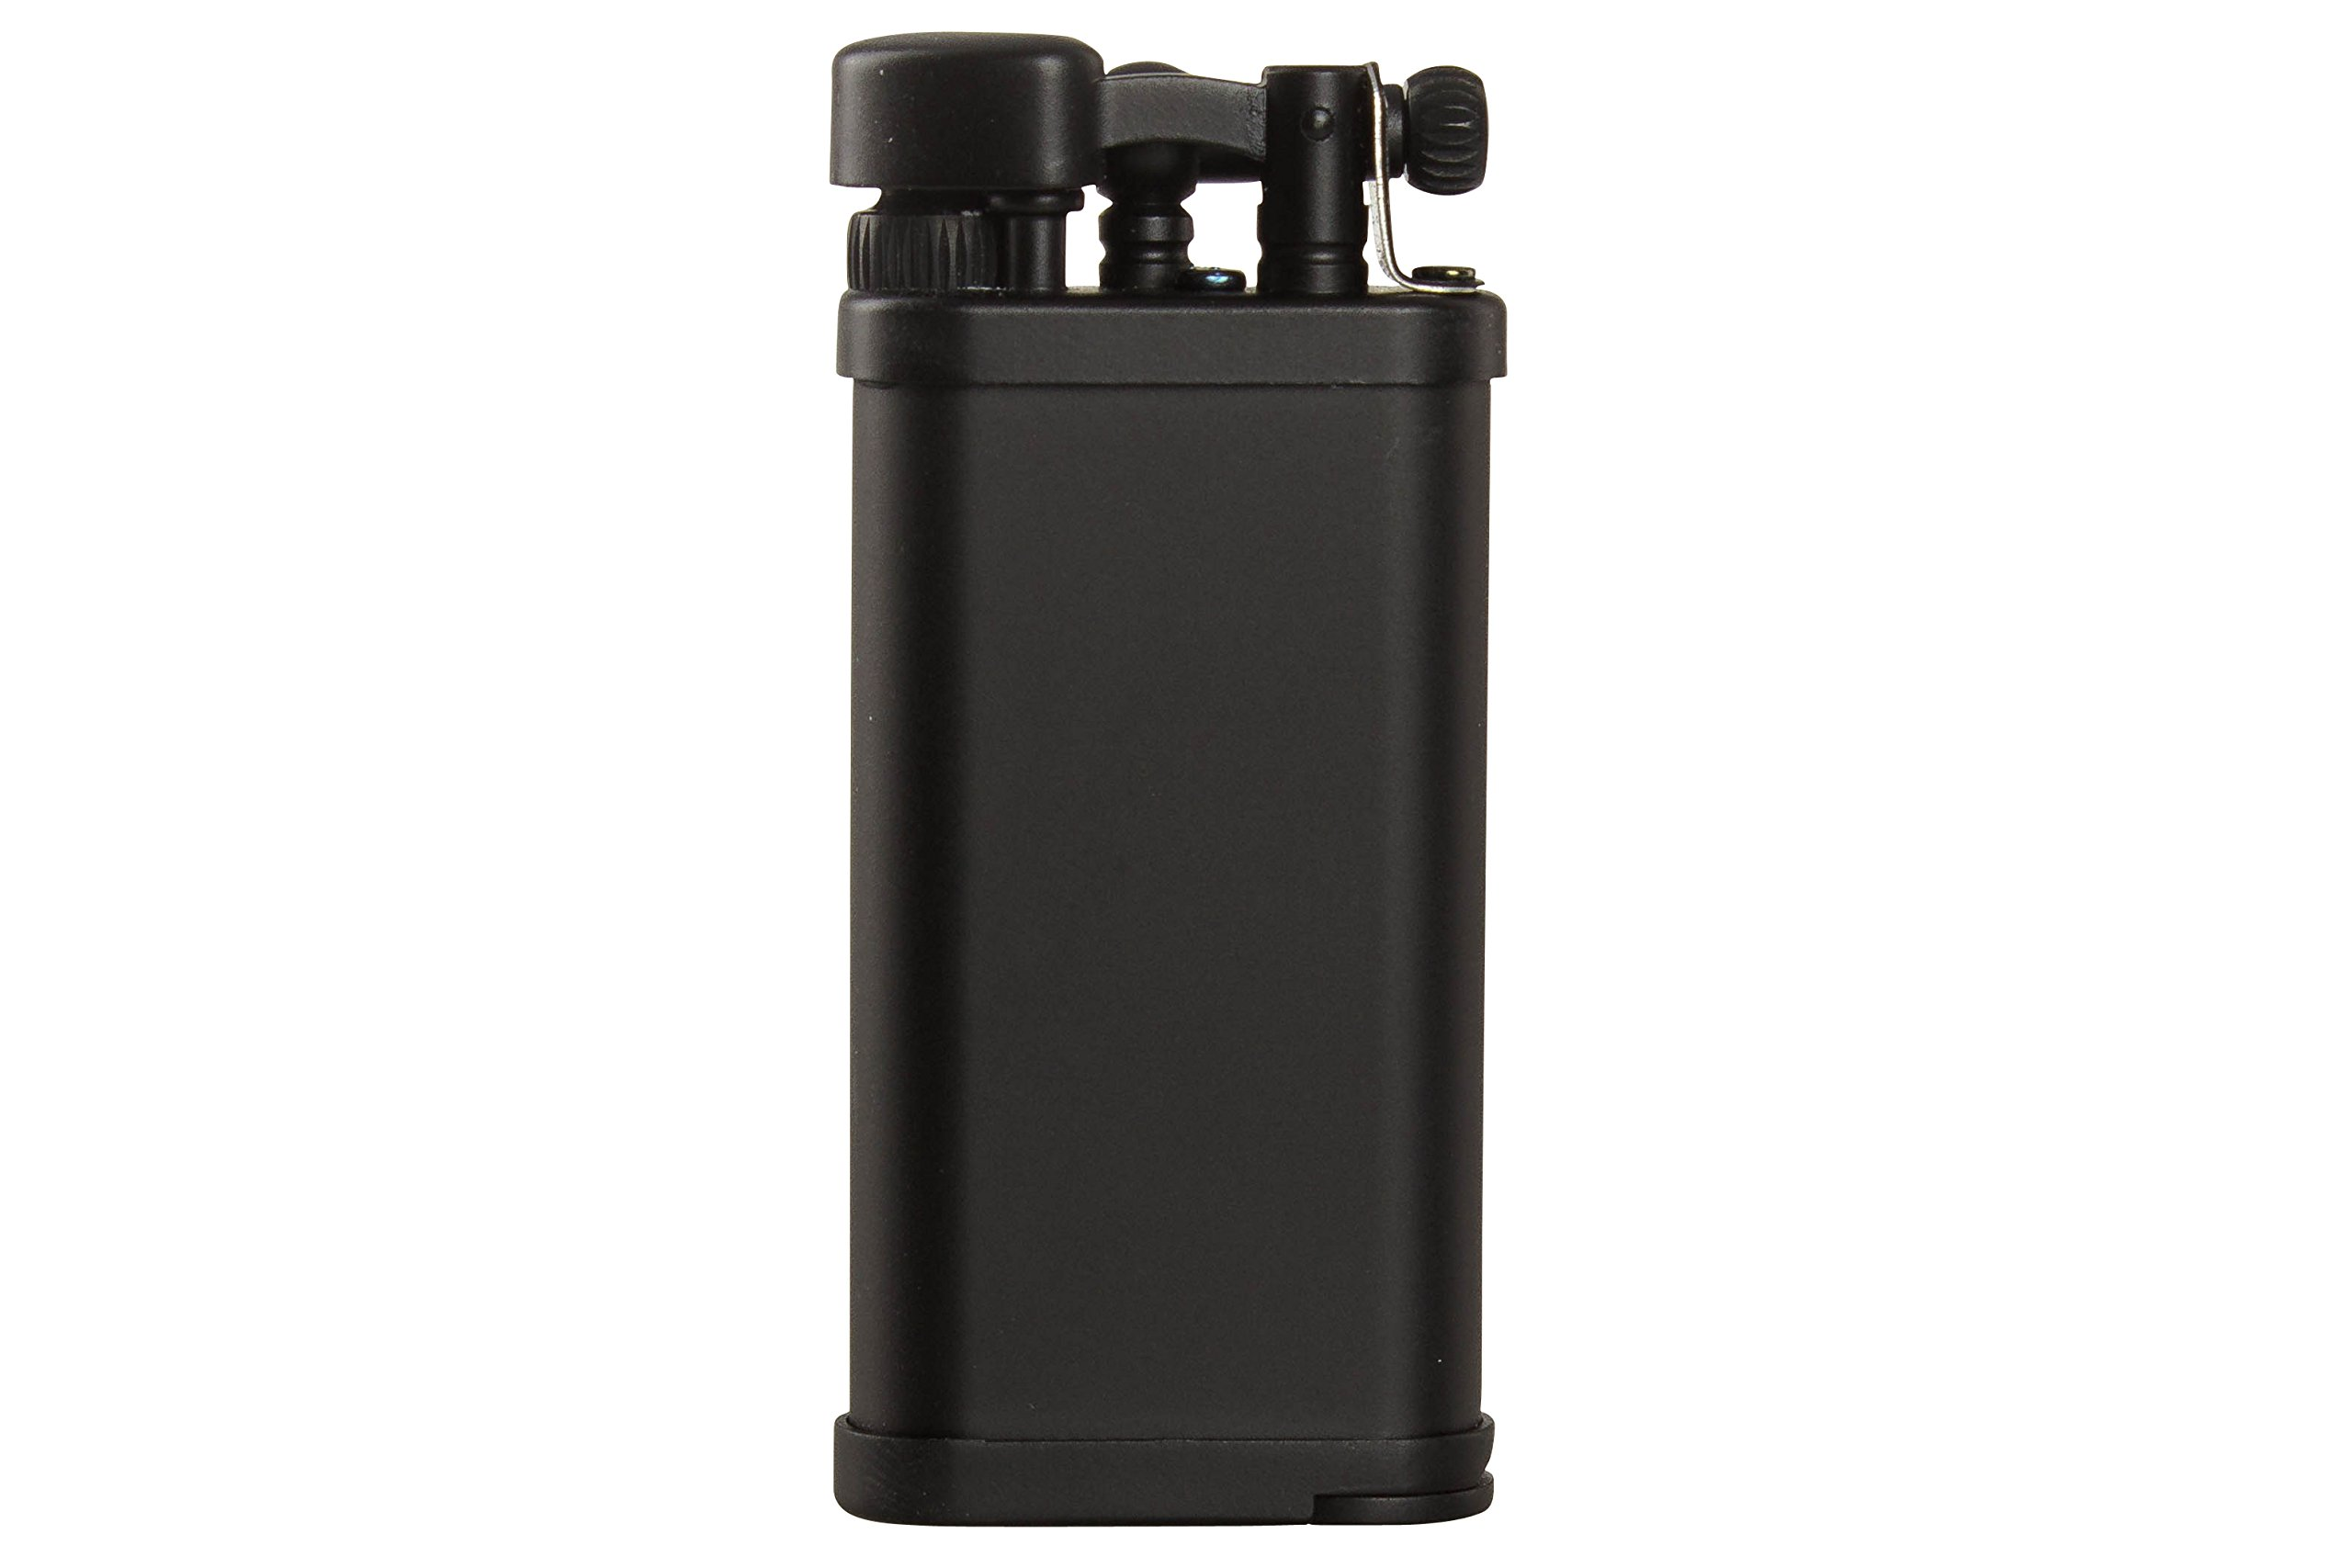 IM Corona Old Boy Black Matte Pipe Lighter